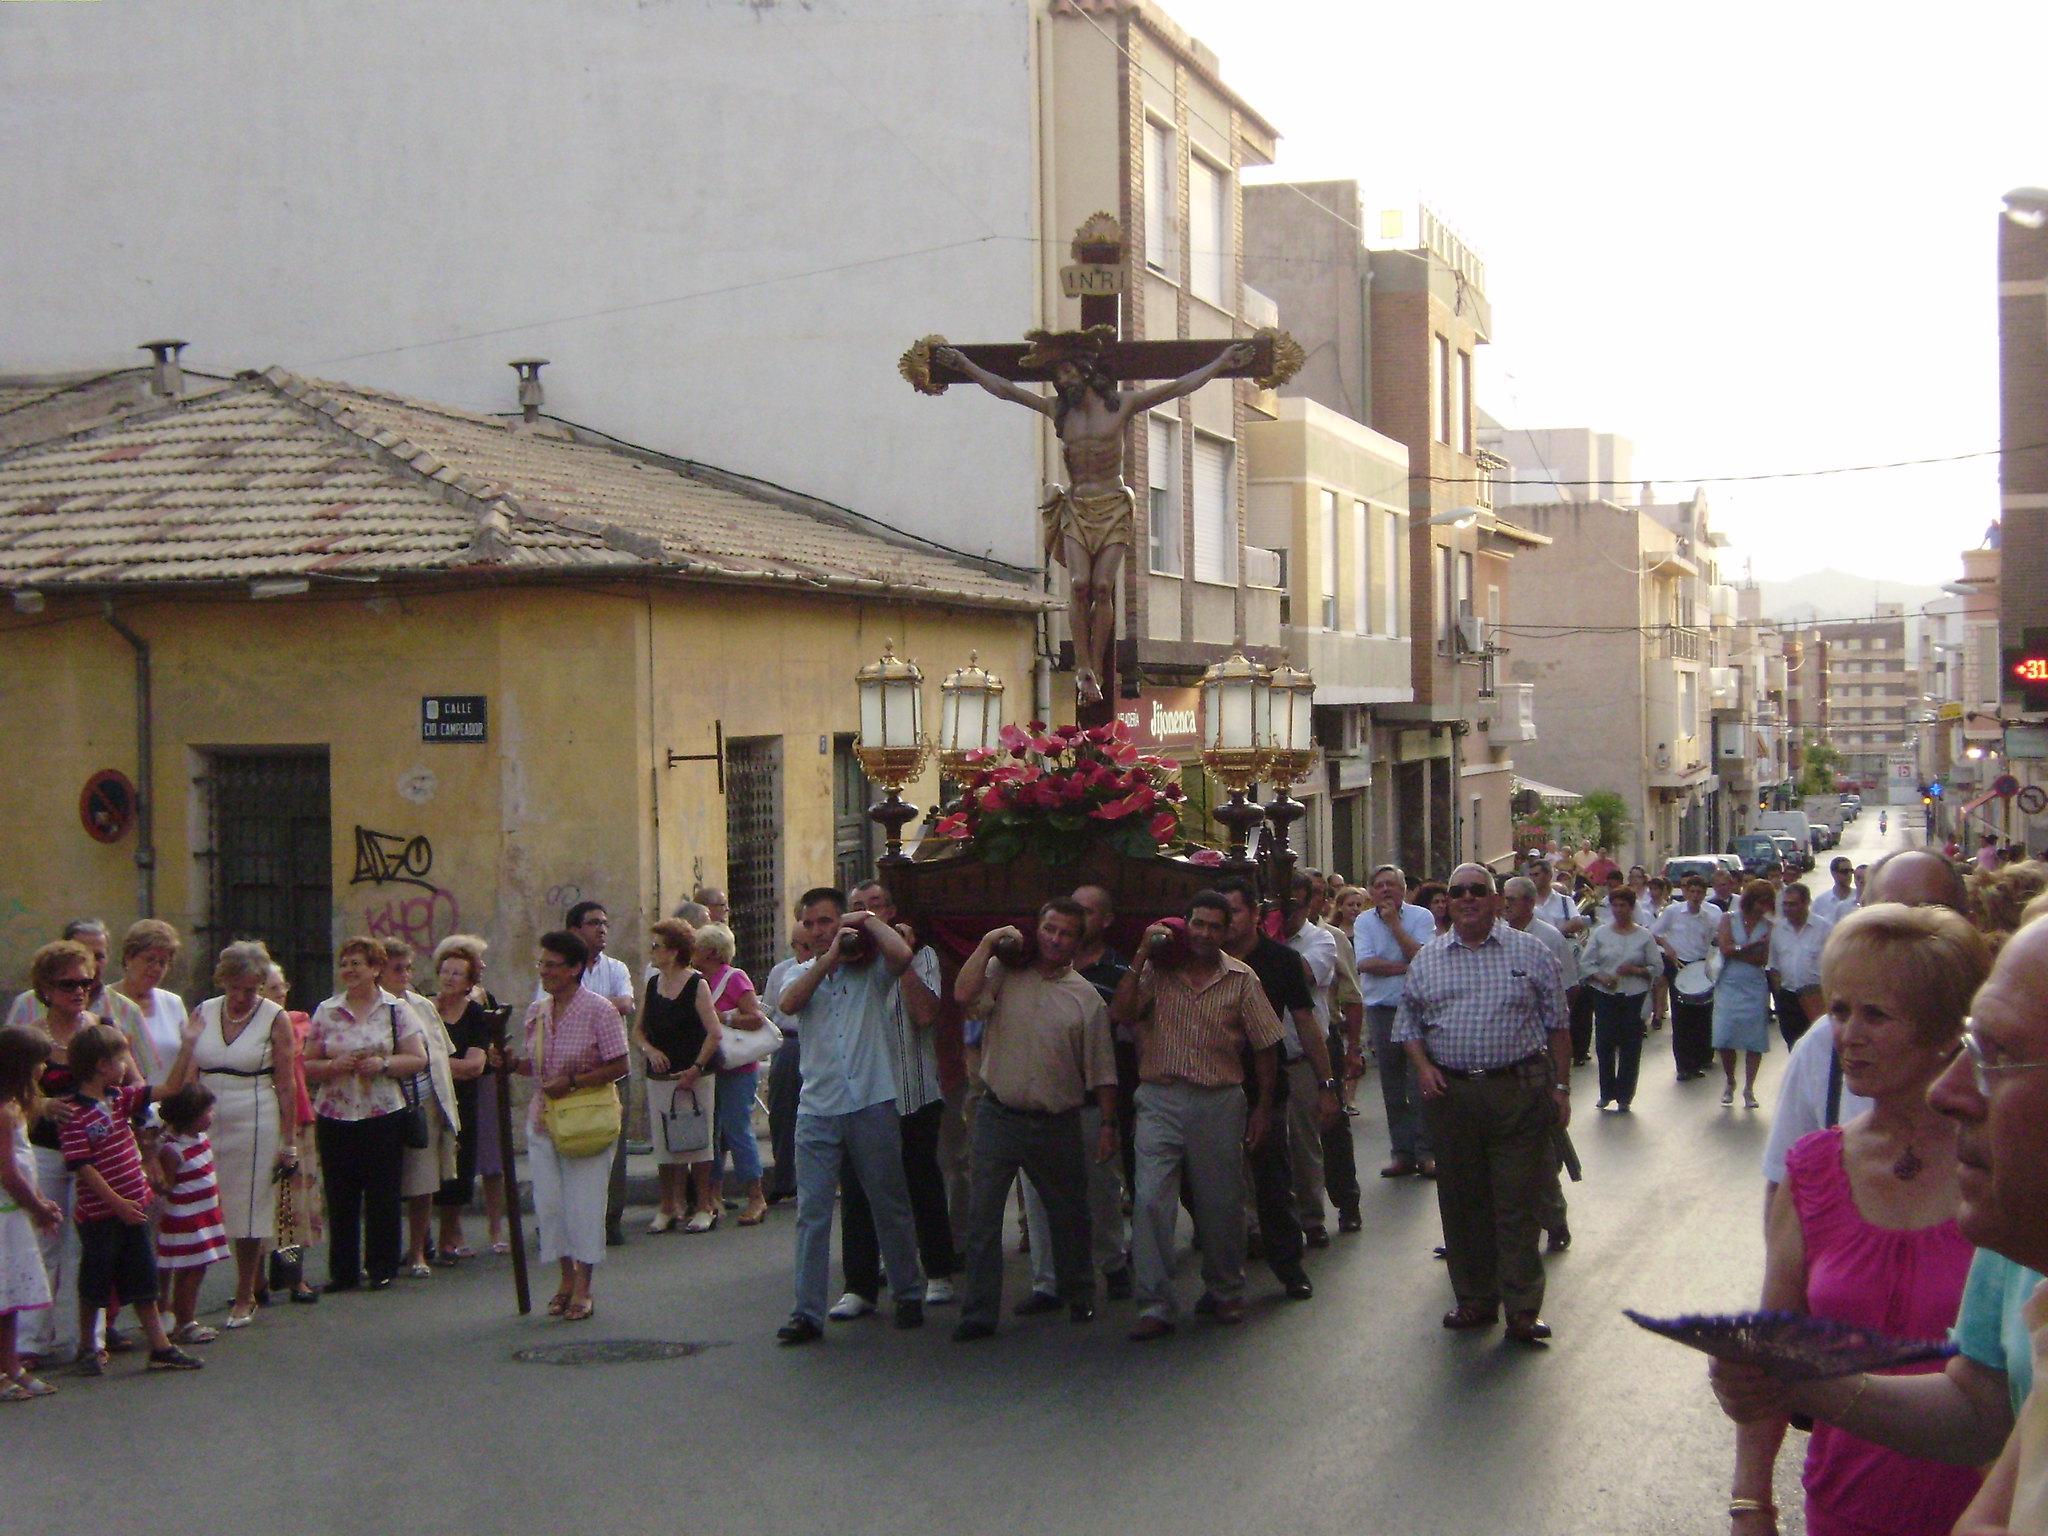 (2009-07-05) - Procesión Subida - Javier Romero Ripoll - (12)